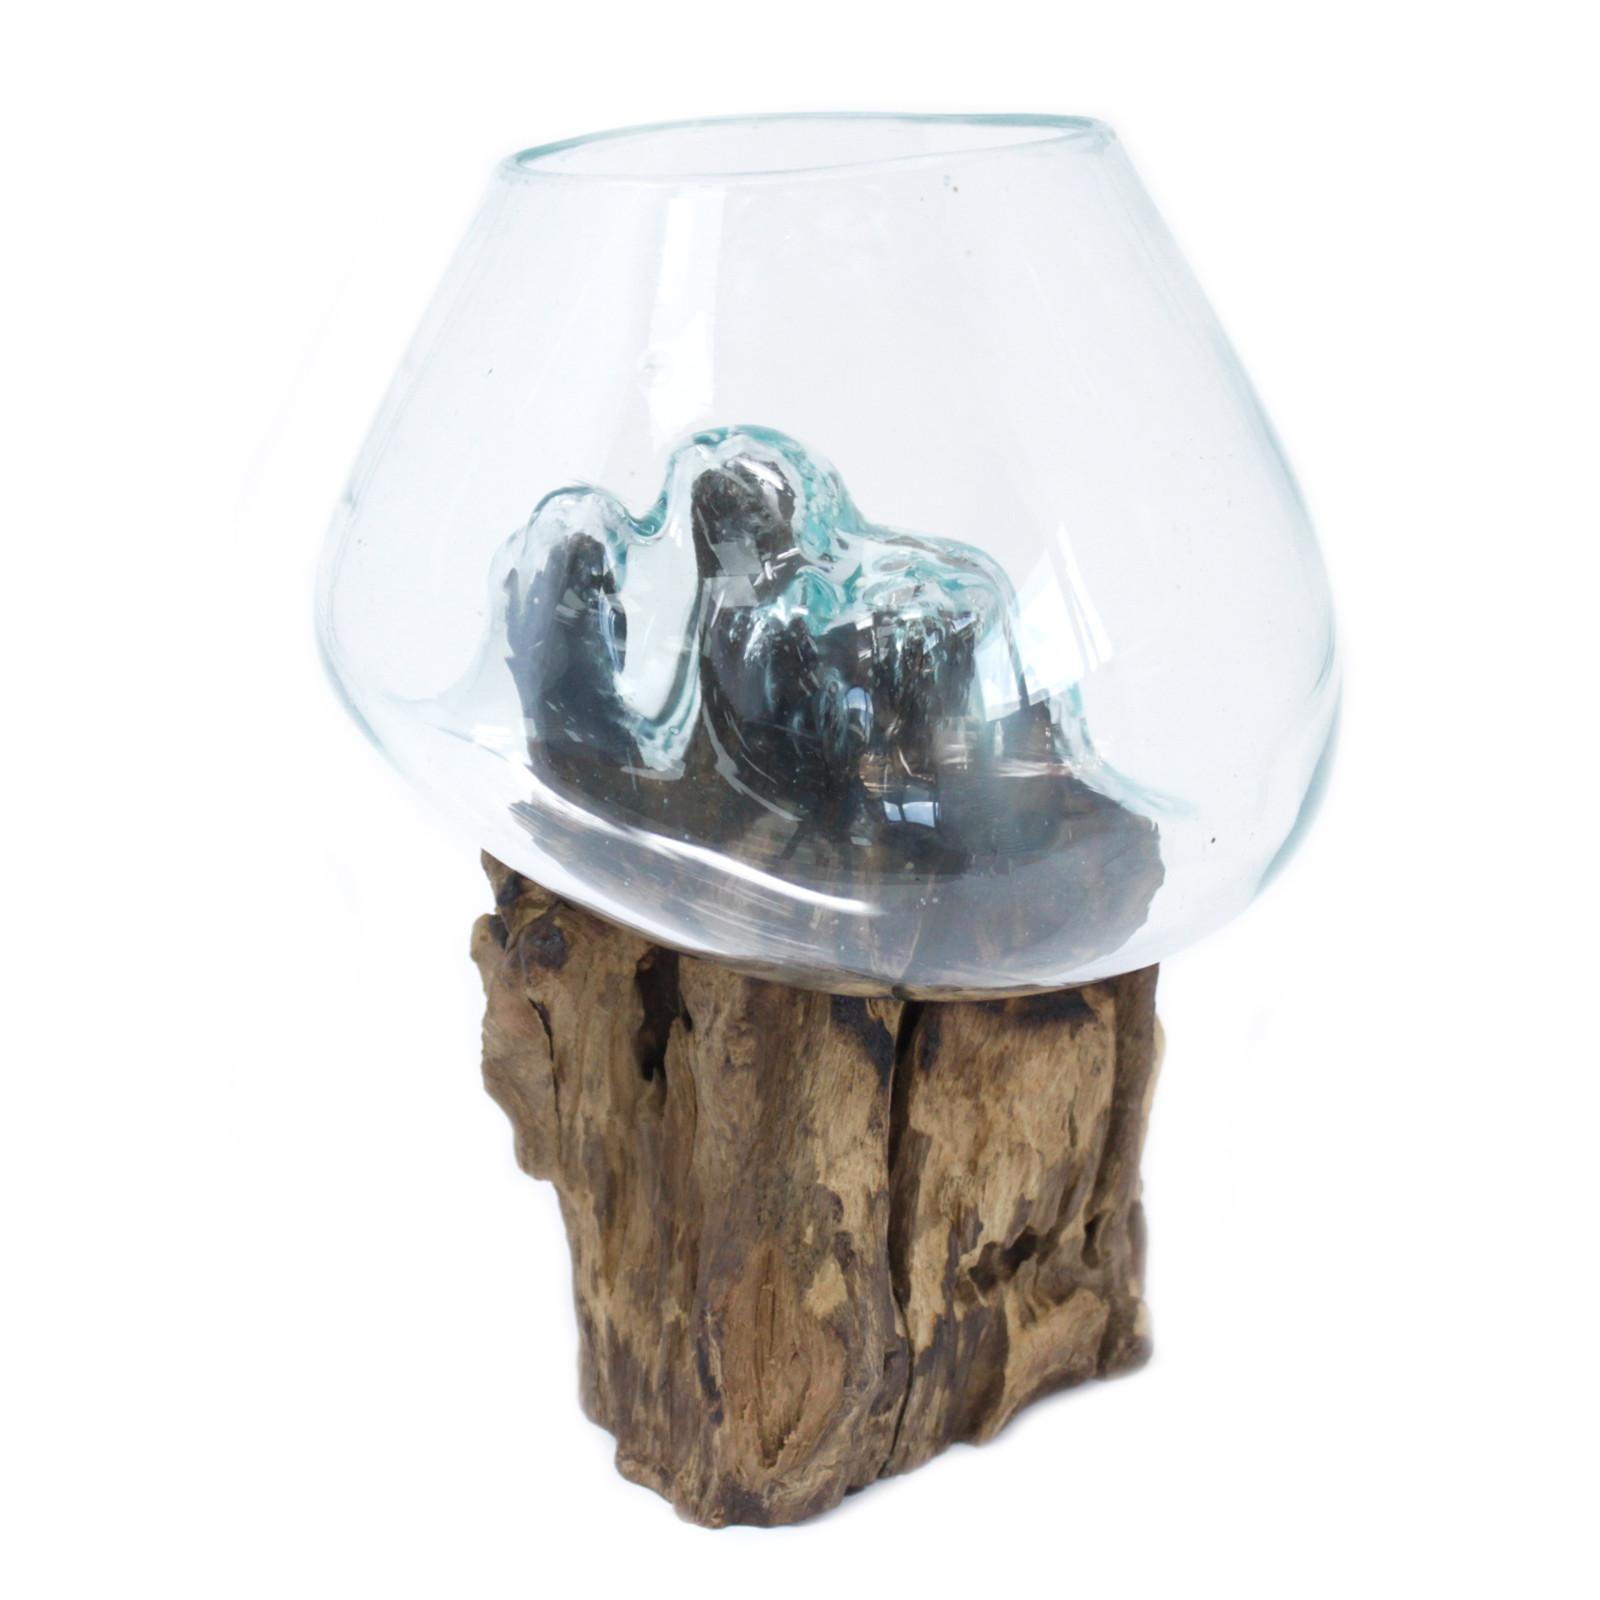 Molton Wood on Glass - Large Bowl